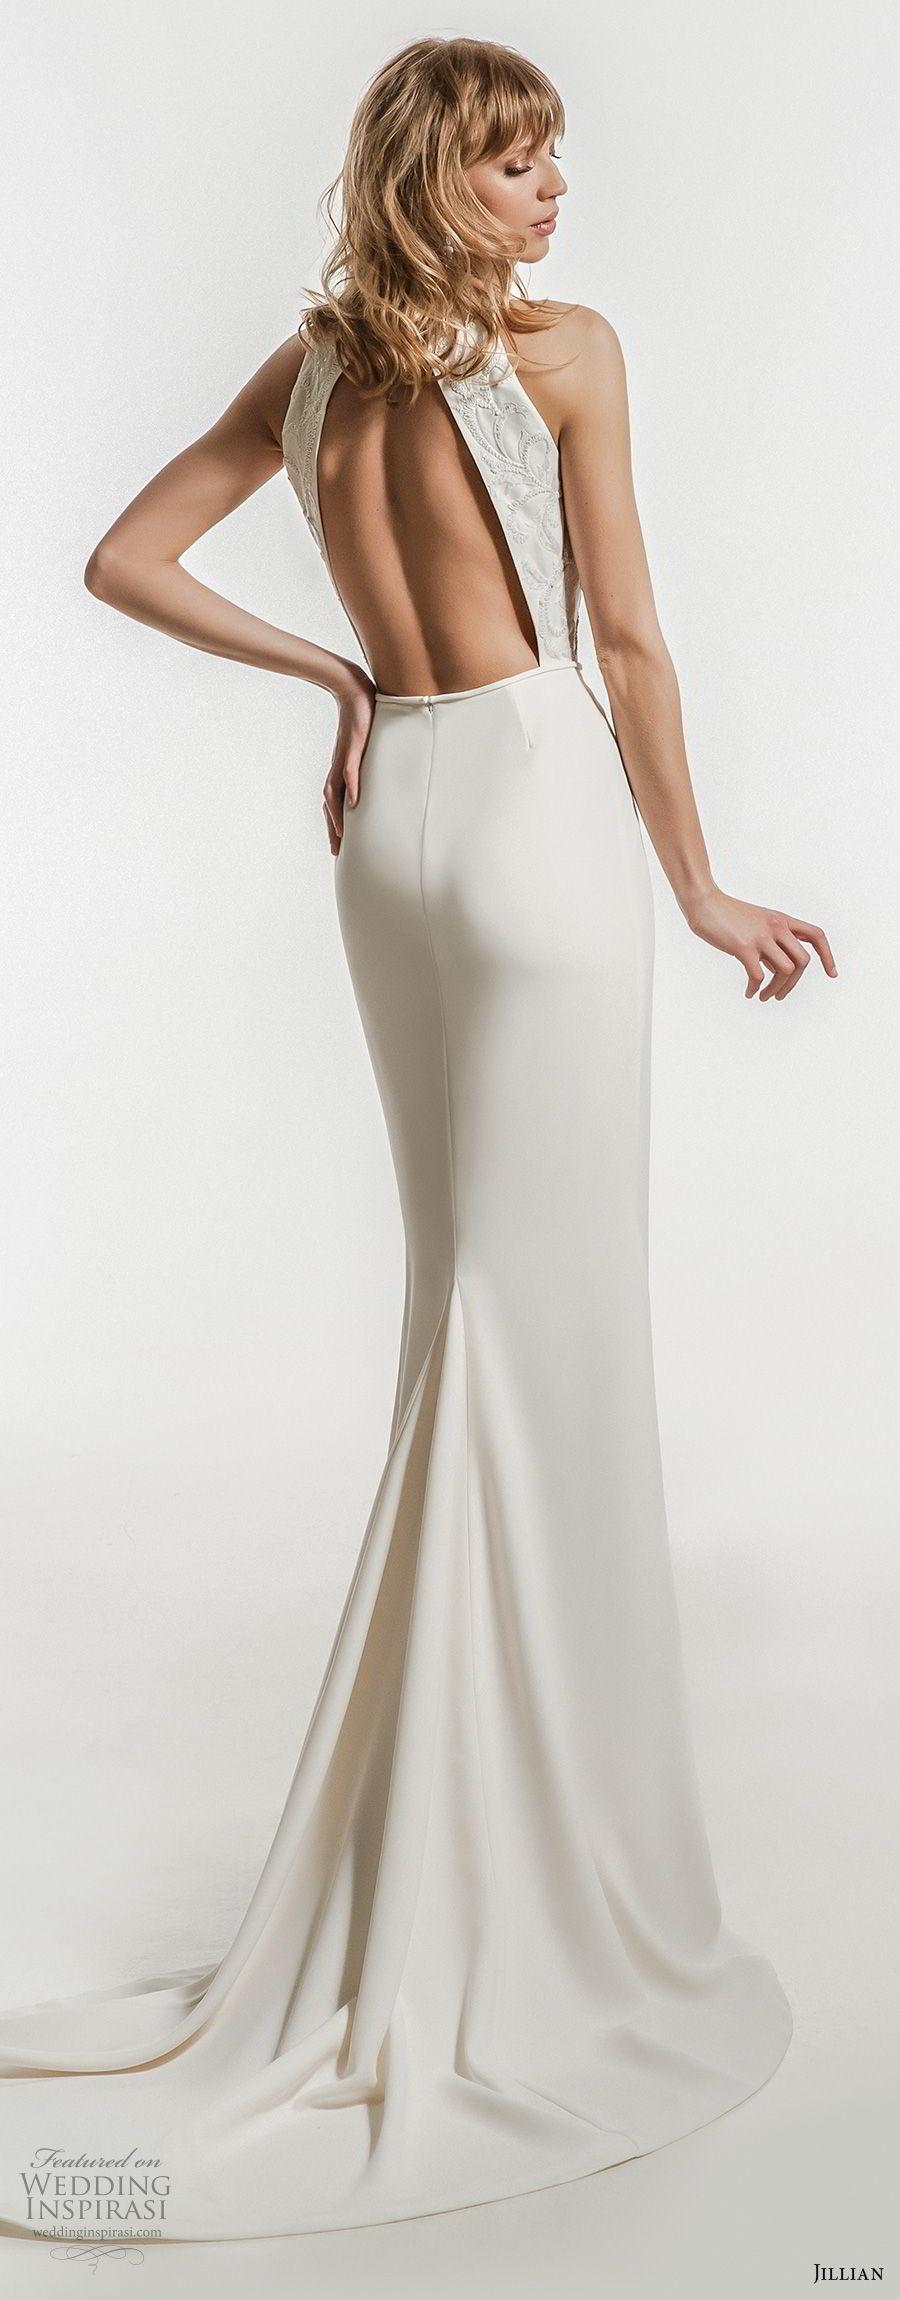 jillian 2018 bridal sleeveles halter jewel neckline heavily embellished bodice clean skirt elegant sheath wedding dress keyhole back sweep train (20) bv